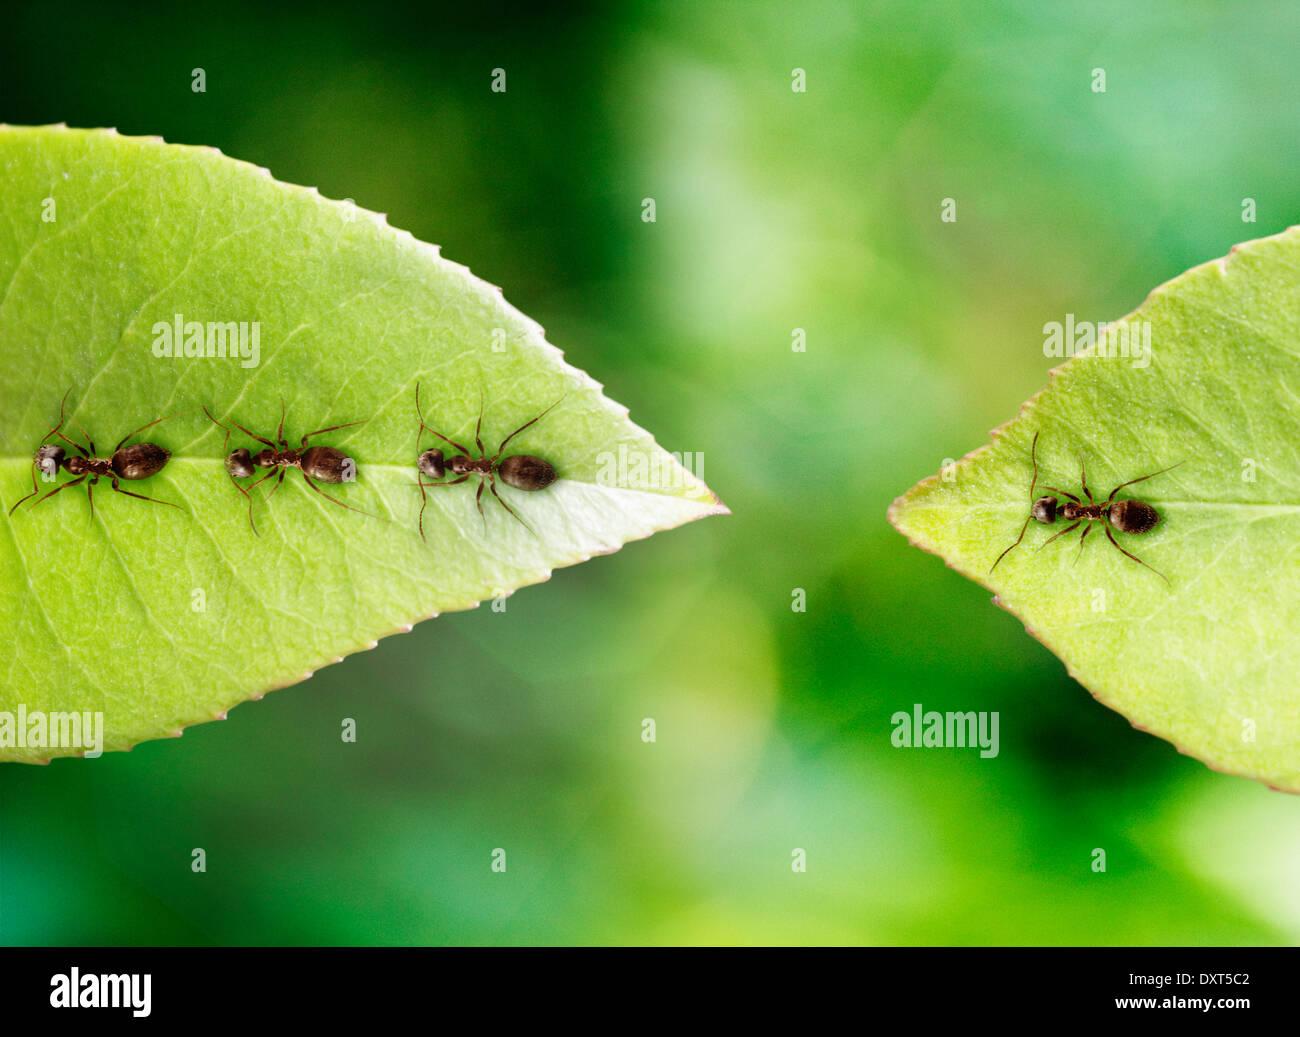 Ameise auf Blatt gestrandet Stockfoto